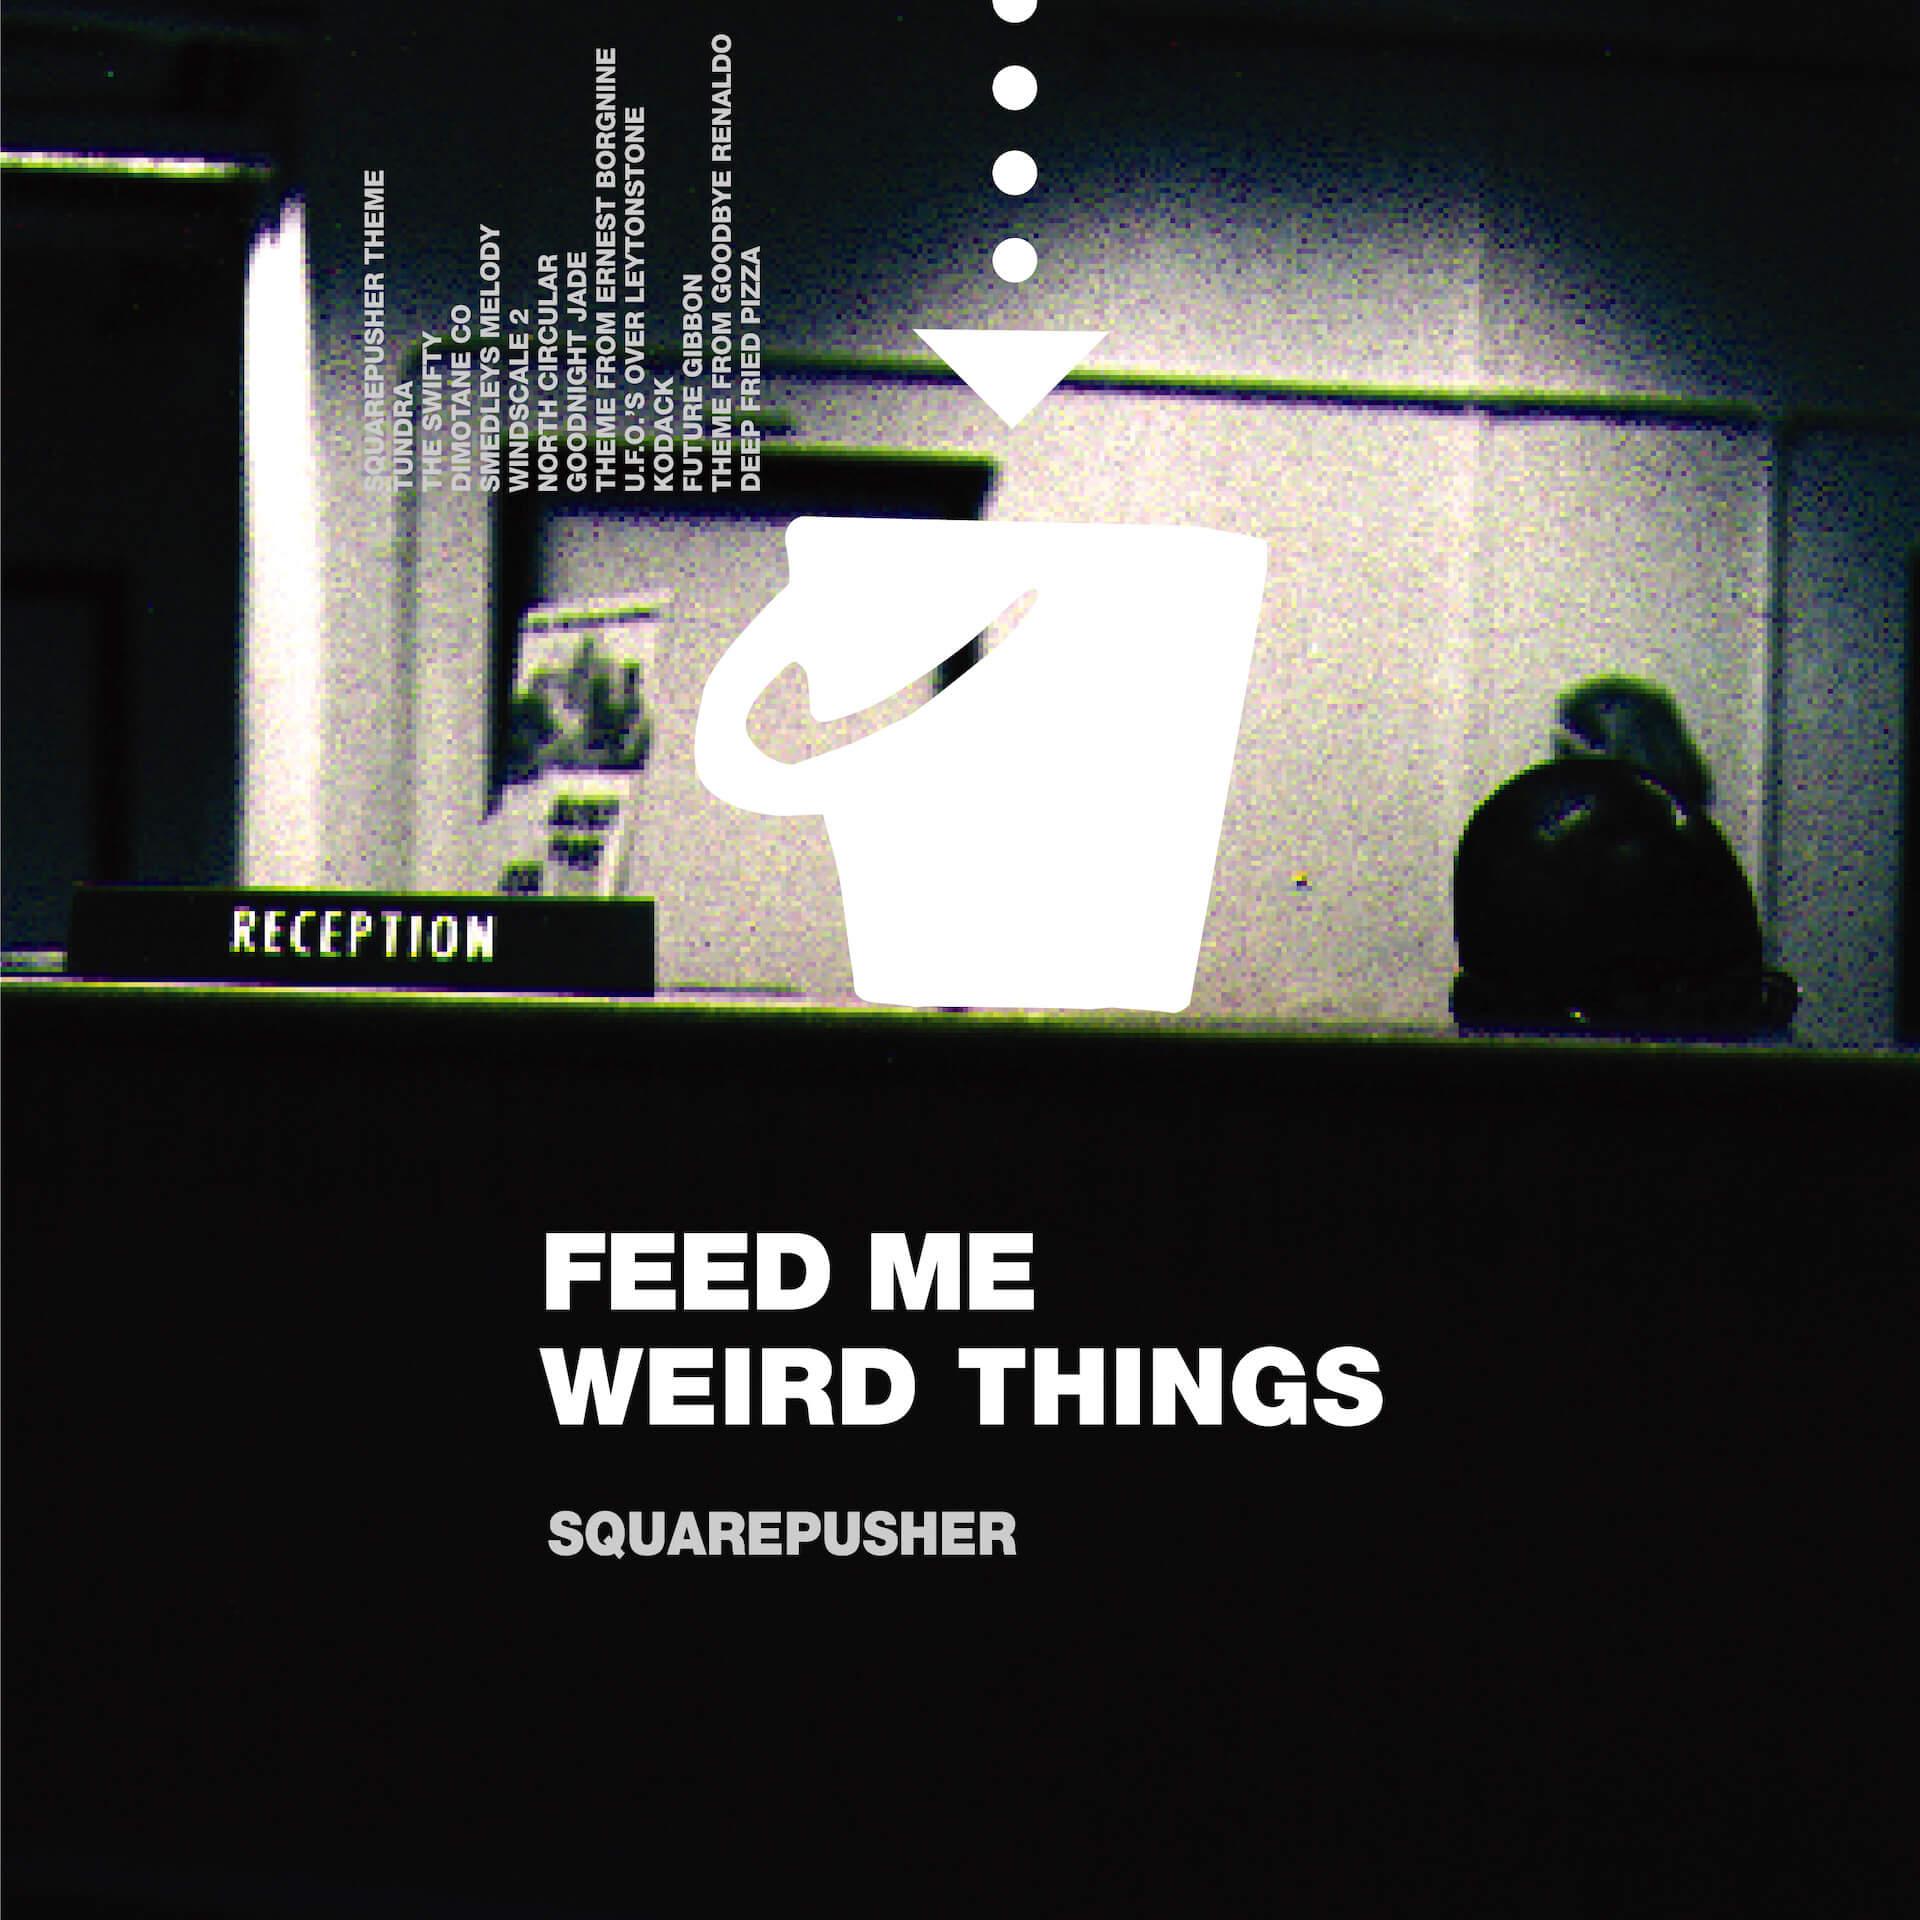 Squarepusherデビューアルバム『Feed Me Weird Things』再発盤が本日ついに発売!待望のサブスクも解禁 music210604_squarepusher_6